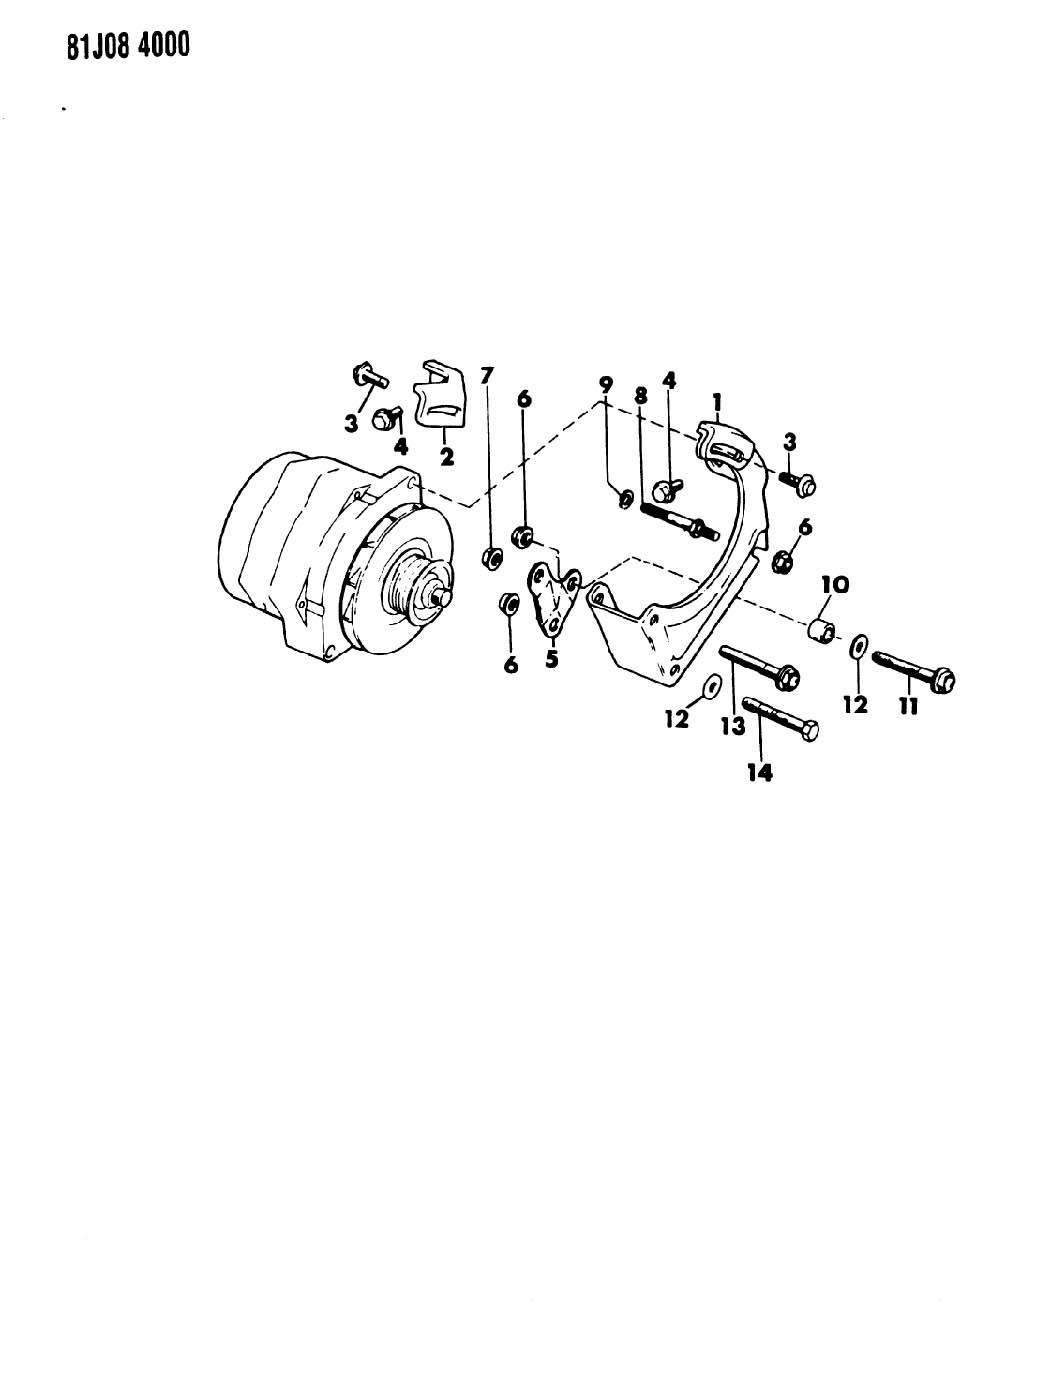 Dodge Intrepid Screw. Hex head. M8x1.25x25. Also serviced